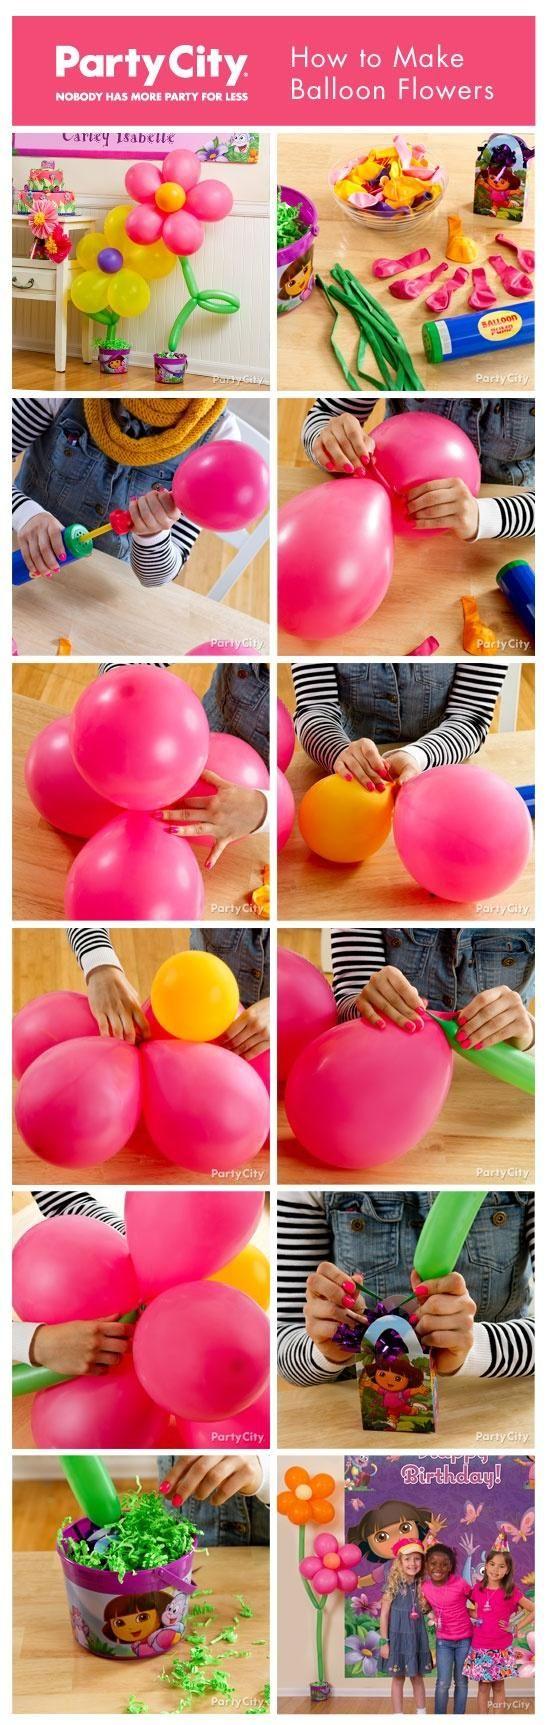 121 best balloons archesshapes images on Pinterest Birthdays